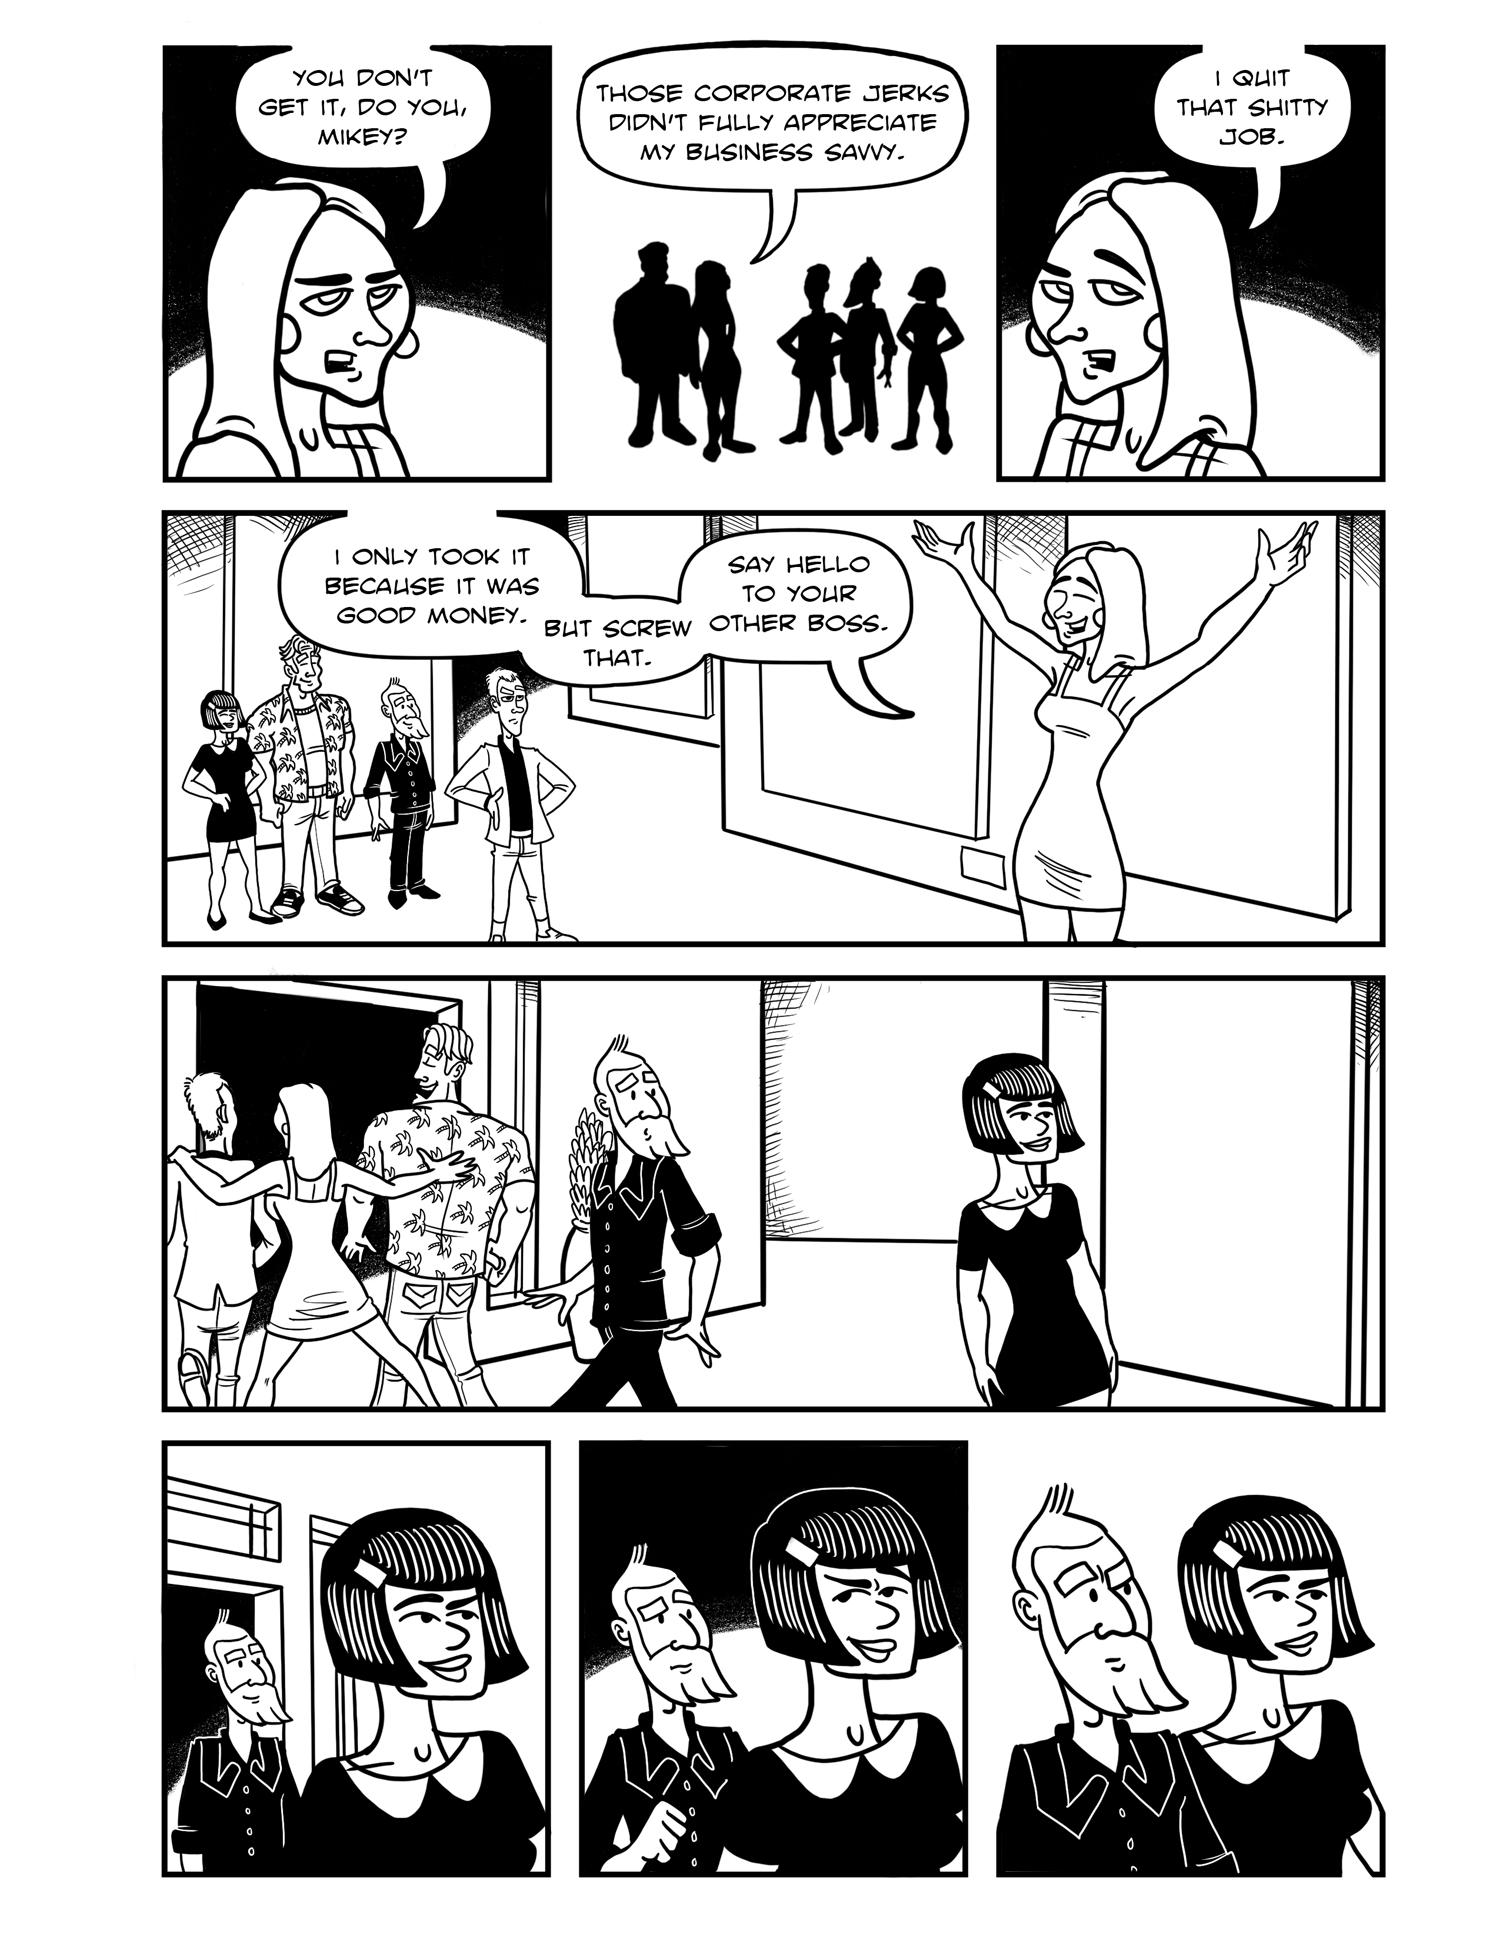 PAGE-326.jpg